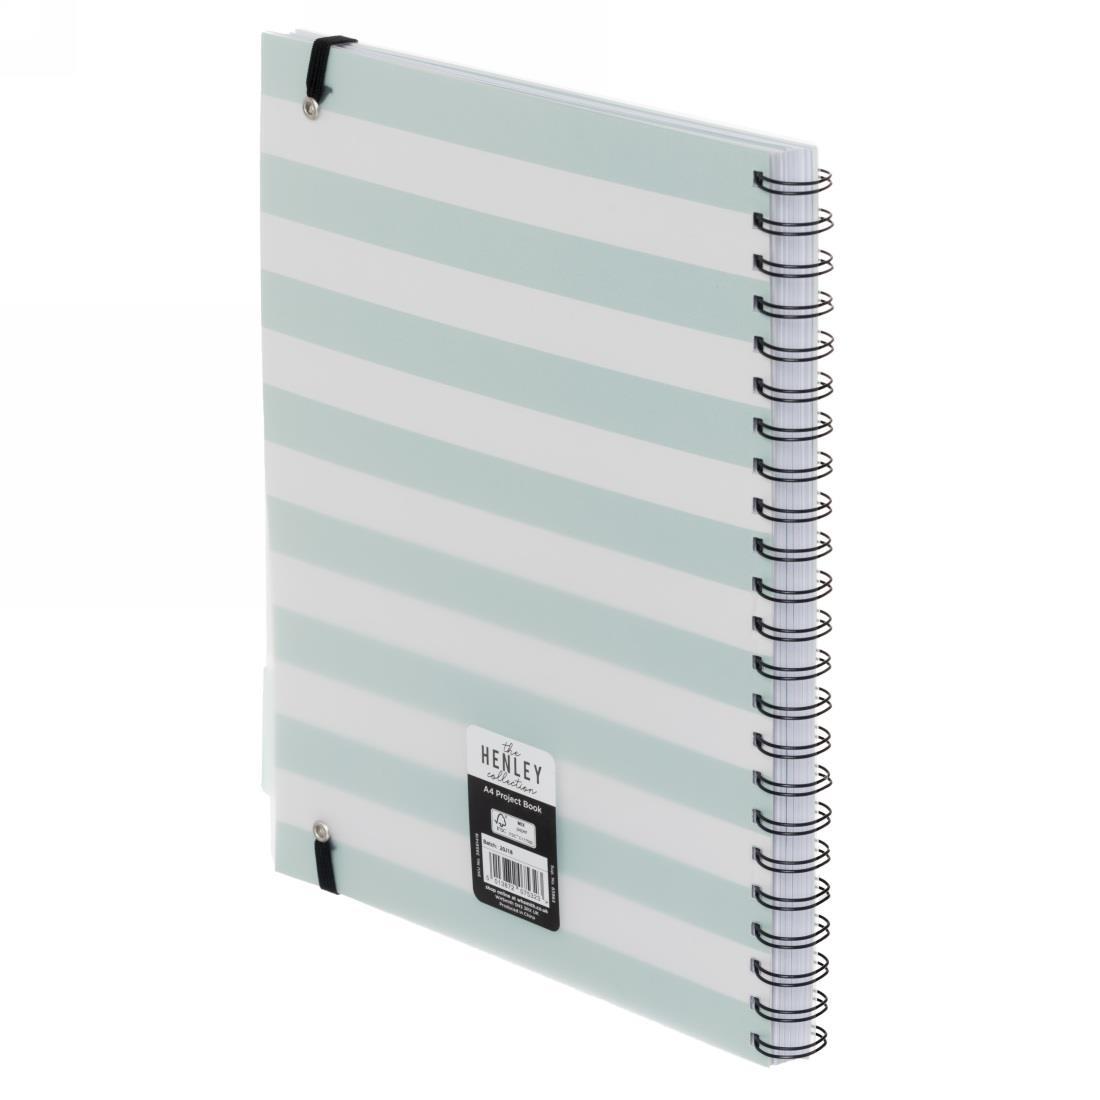 WHSmith Henley Blue Dot Wiro Bound A4 Notebook Wiro Bound Side Binding